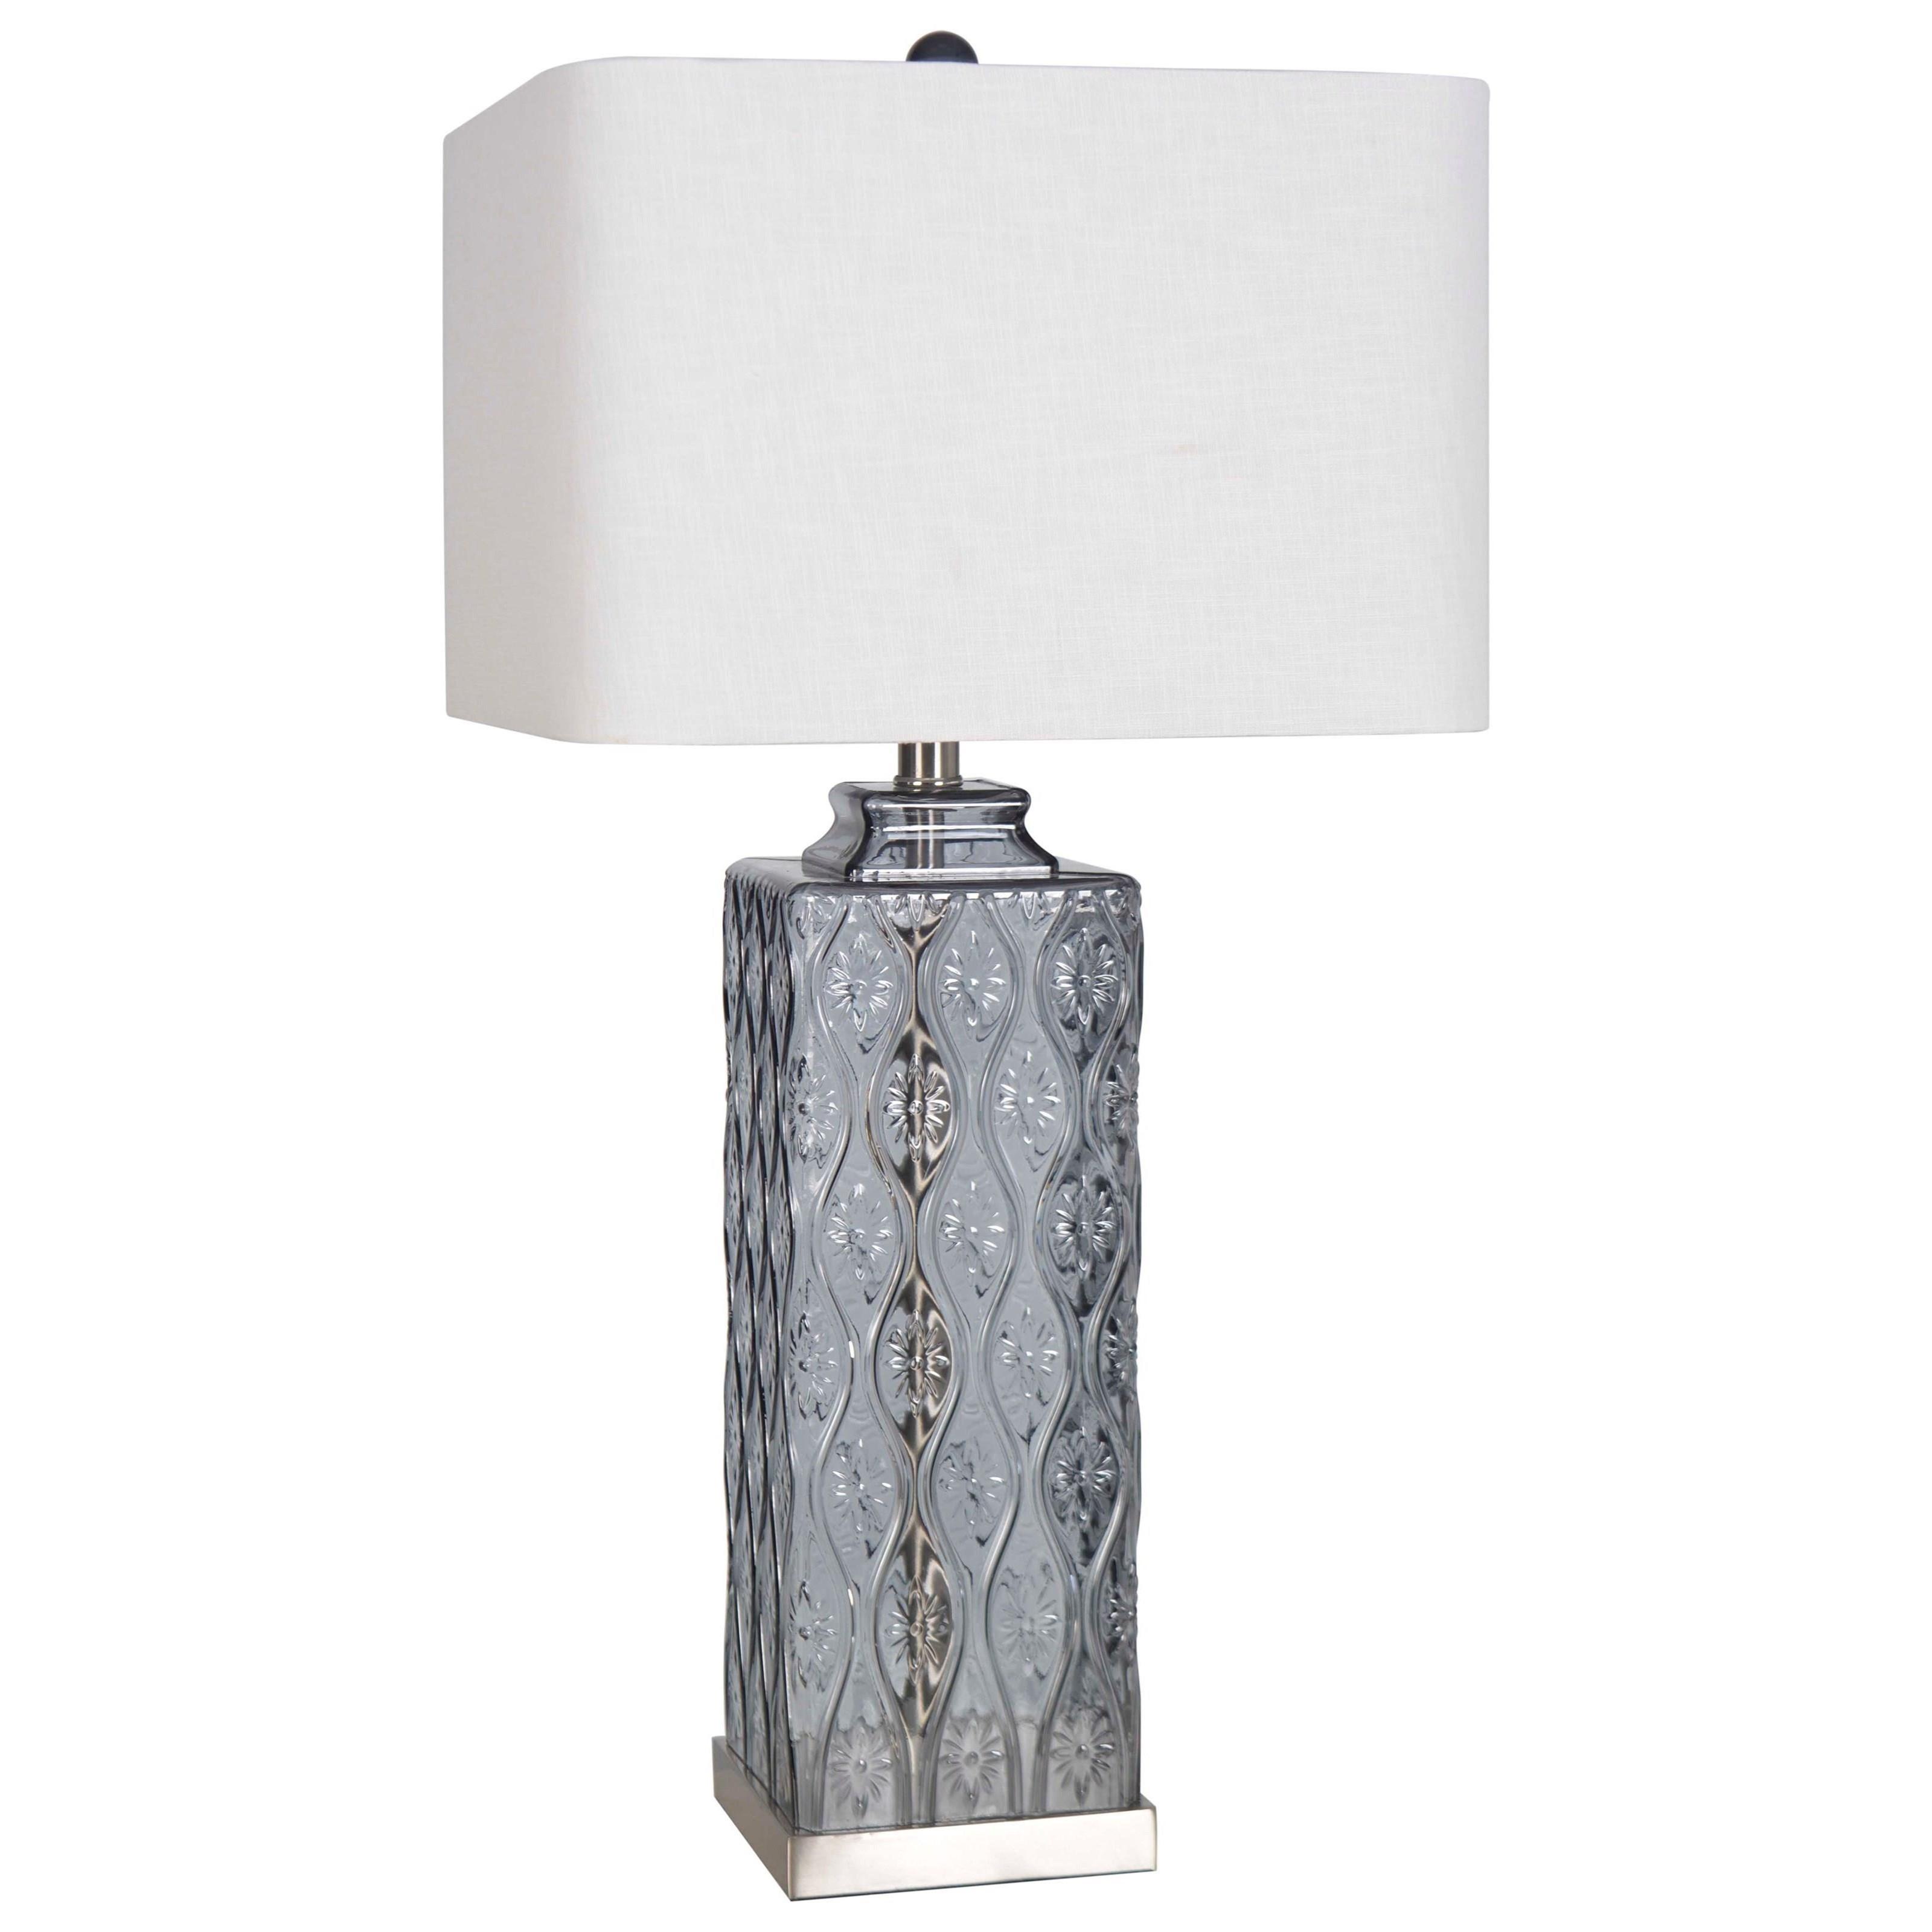 Lamps Per Se Lamps Glass Table Lamp - Item Number: LPS-243